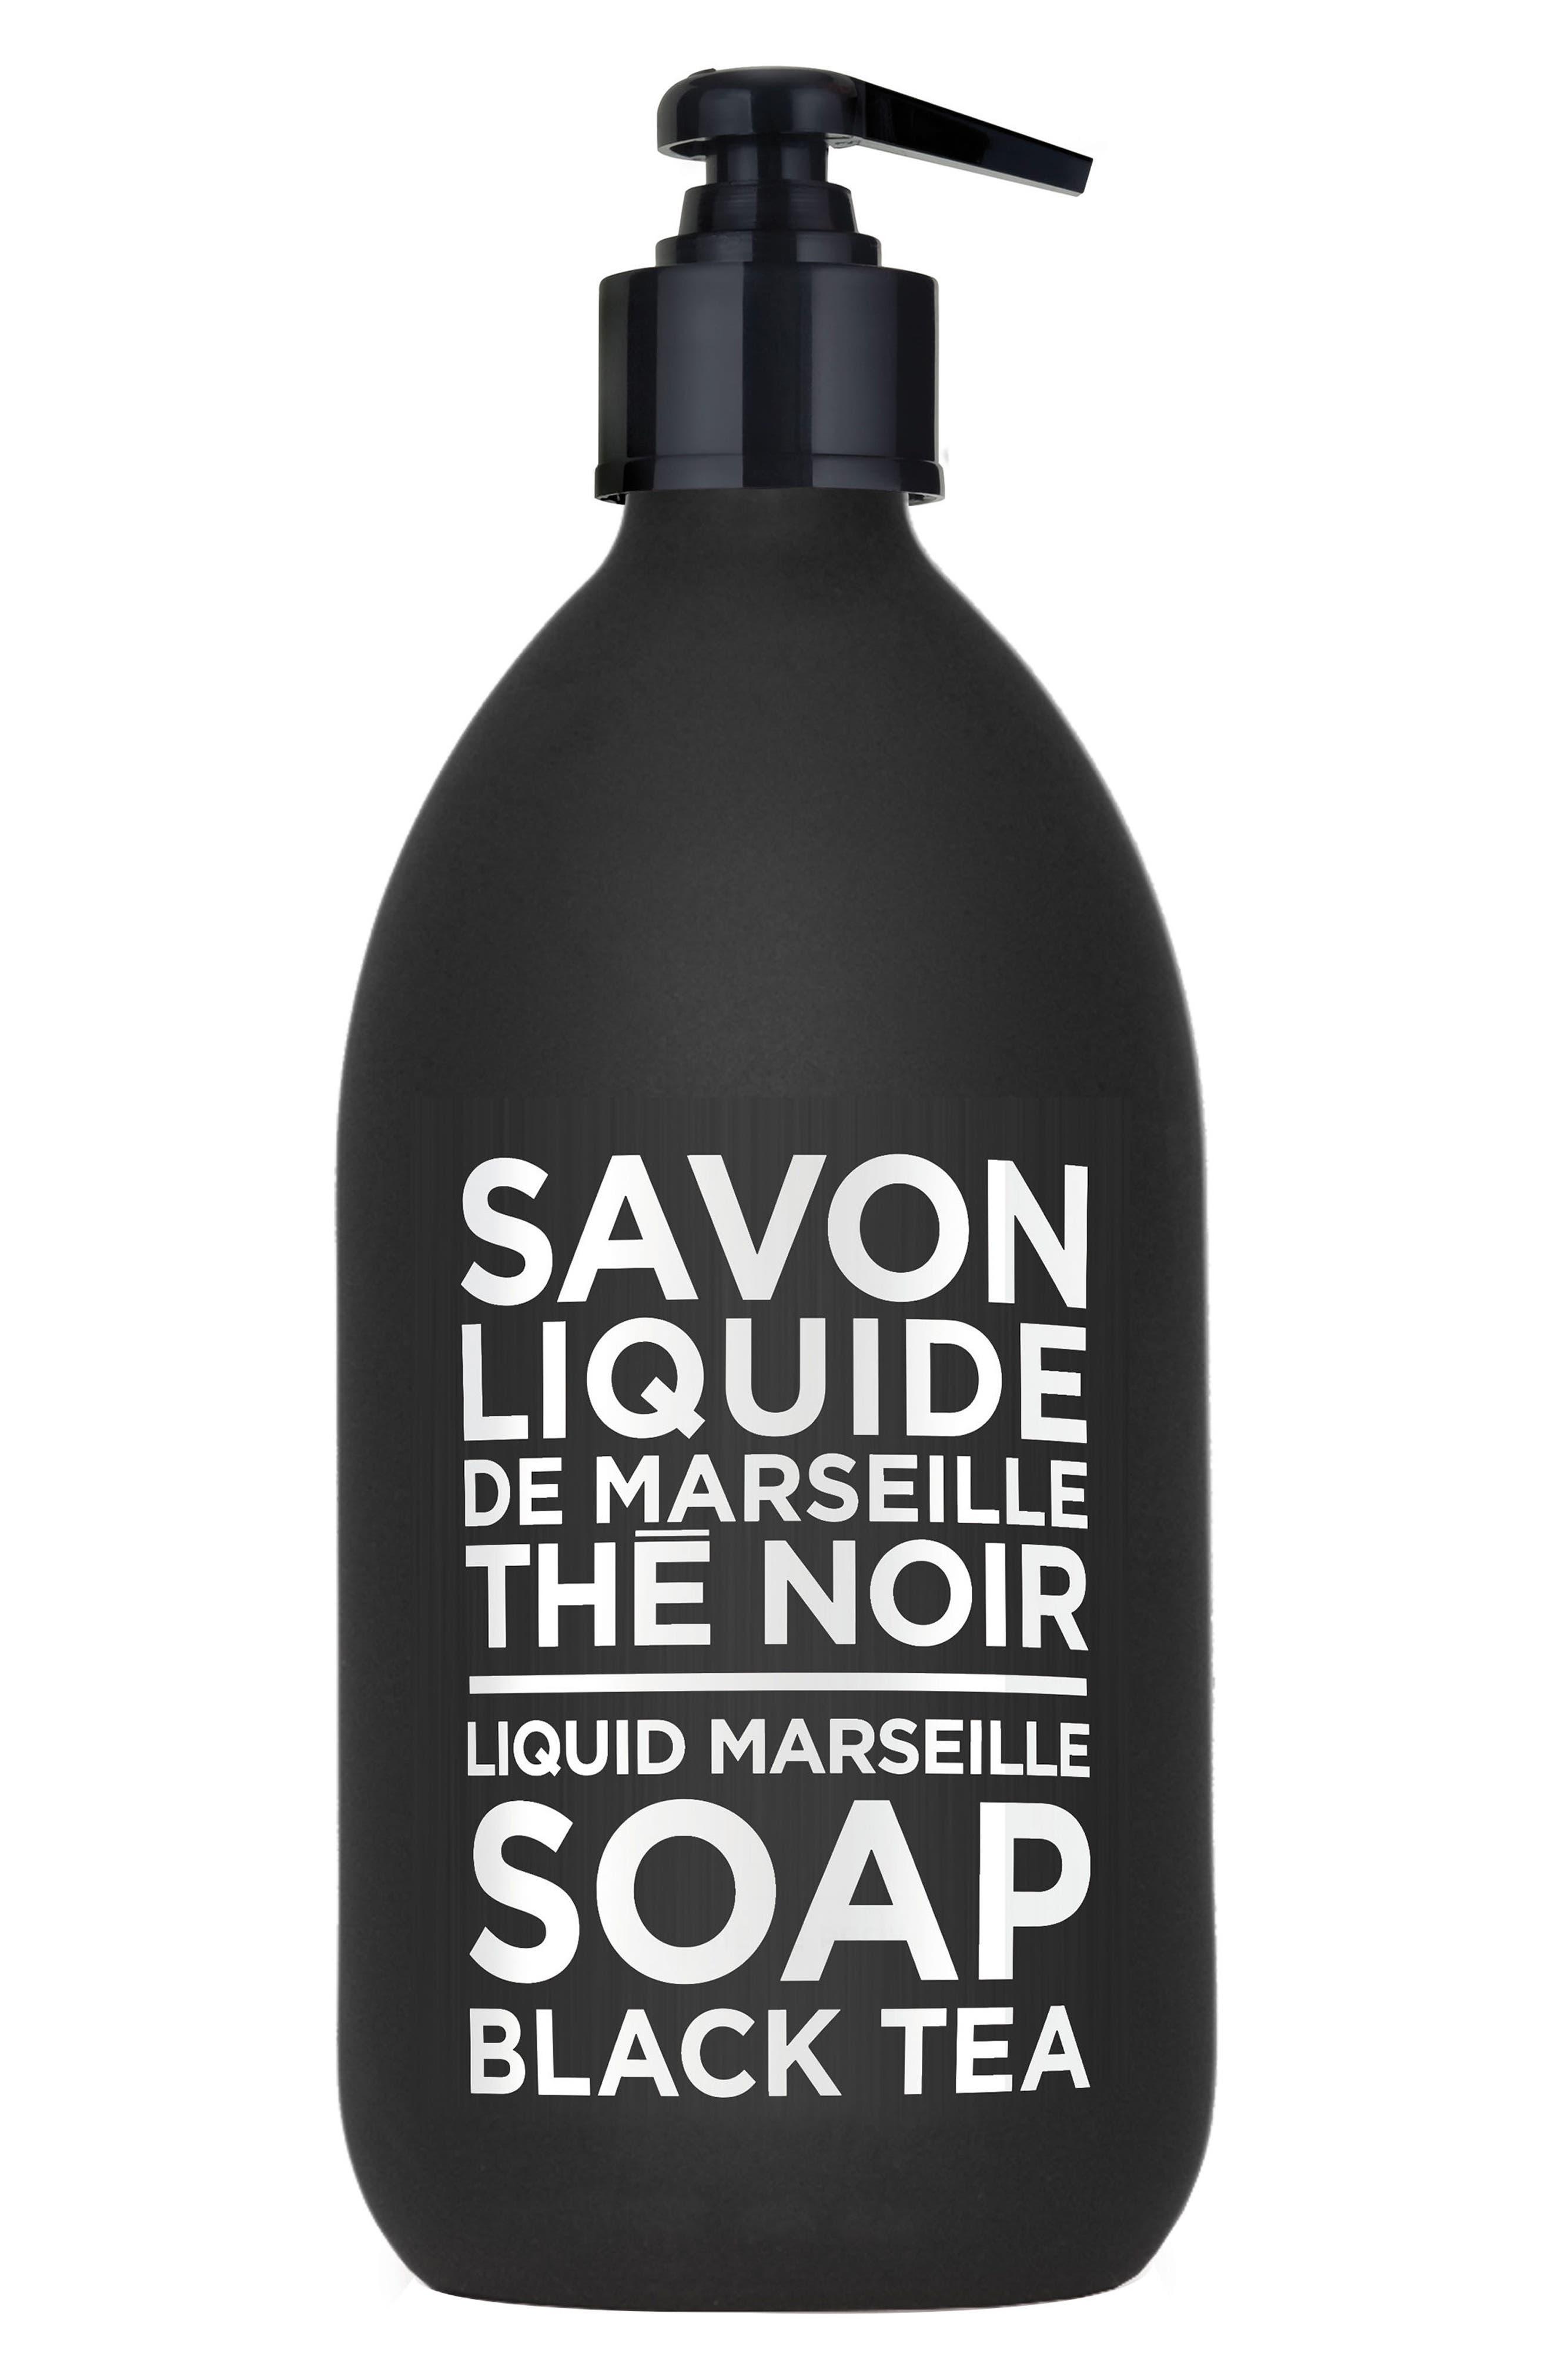 Black Tea Liquid Marseille Soap,                             Main thumbnail 1, color,                             No Color